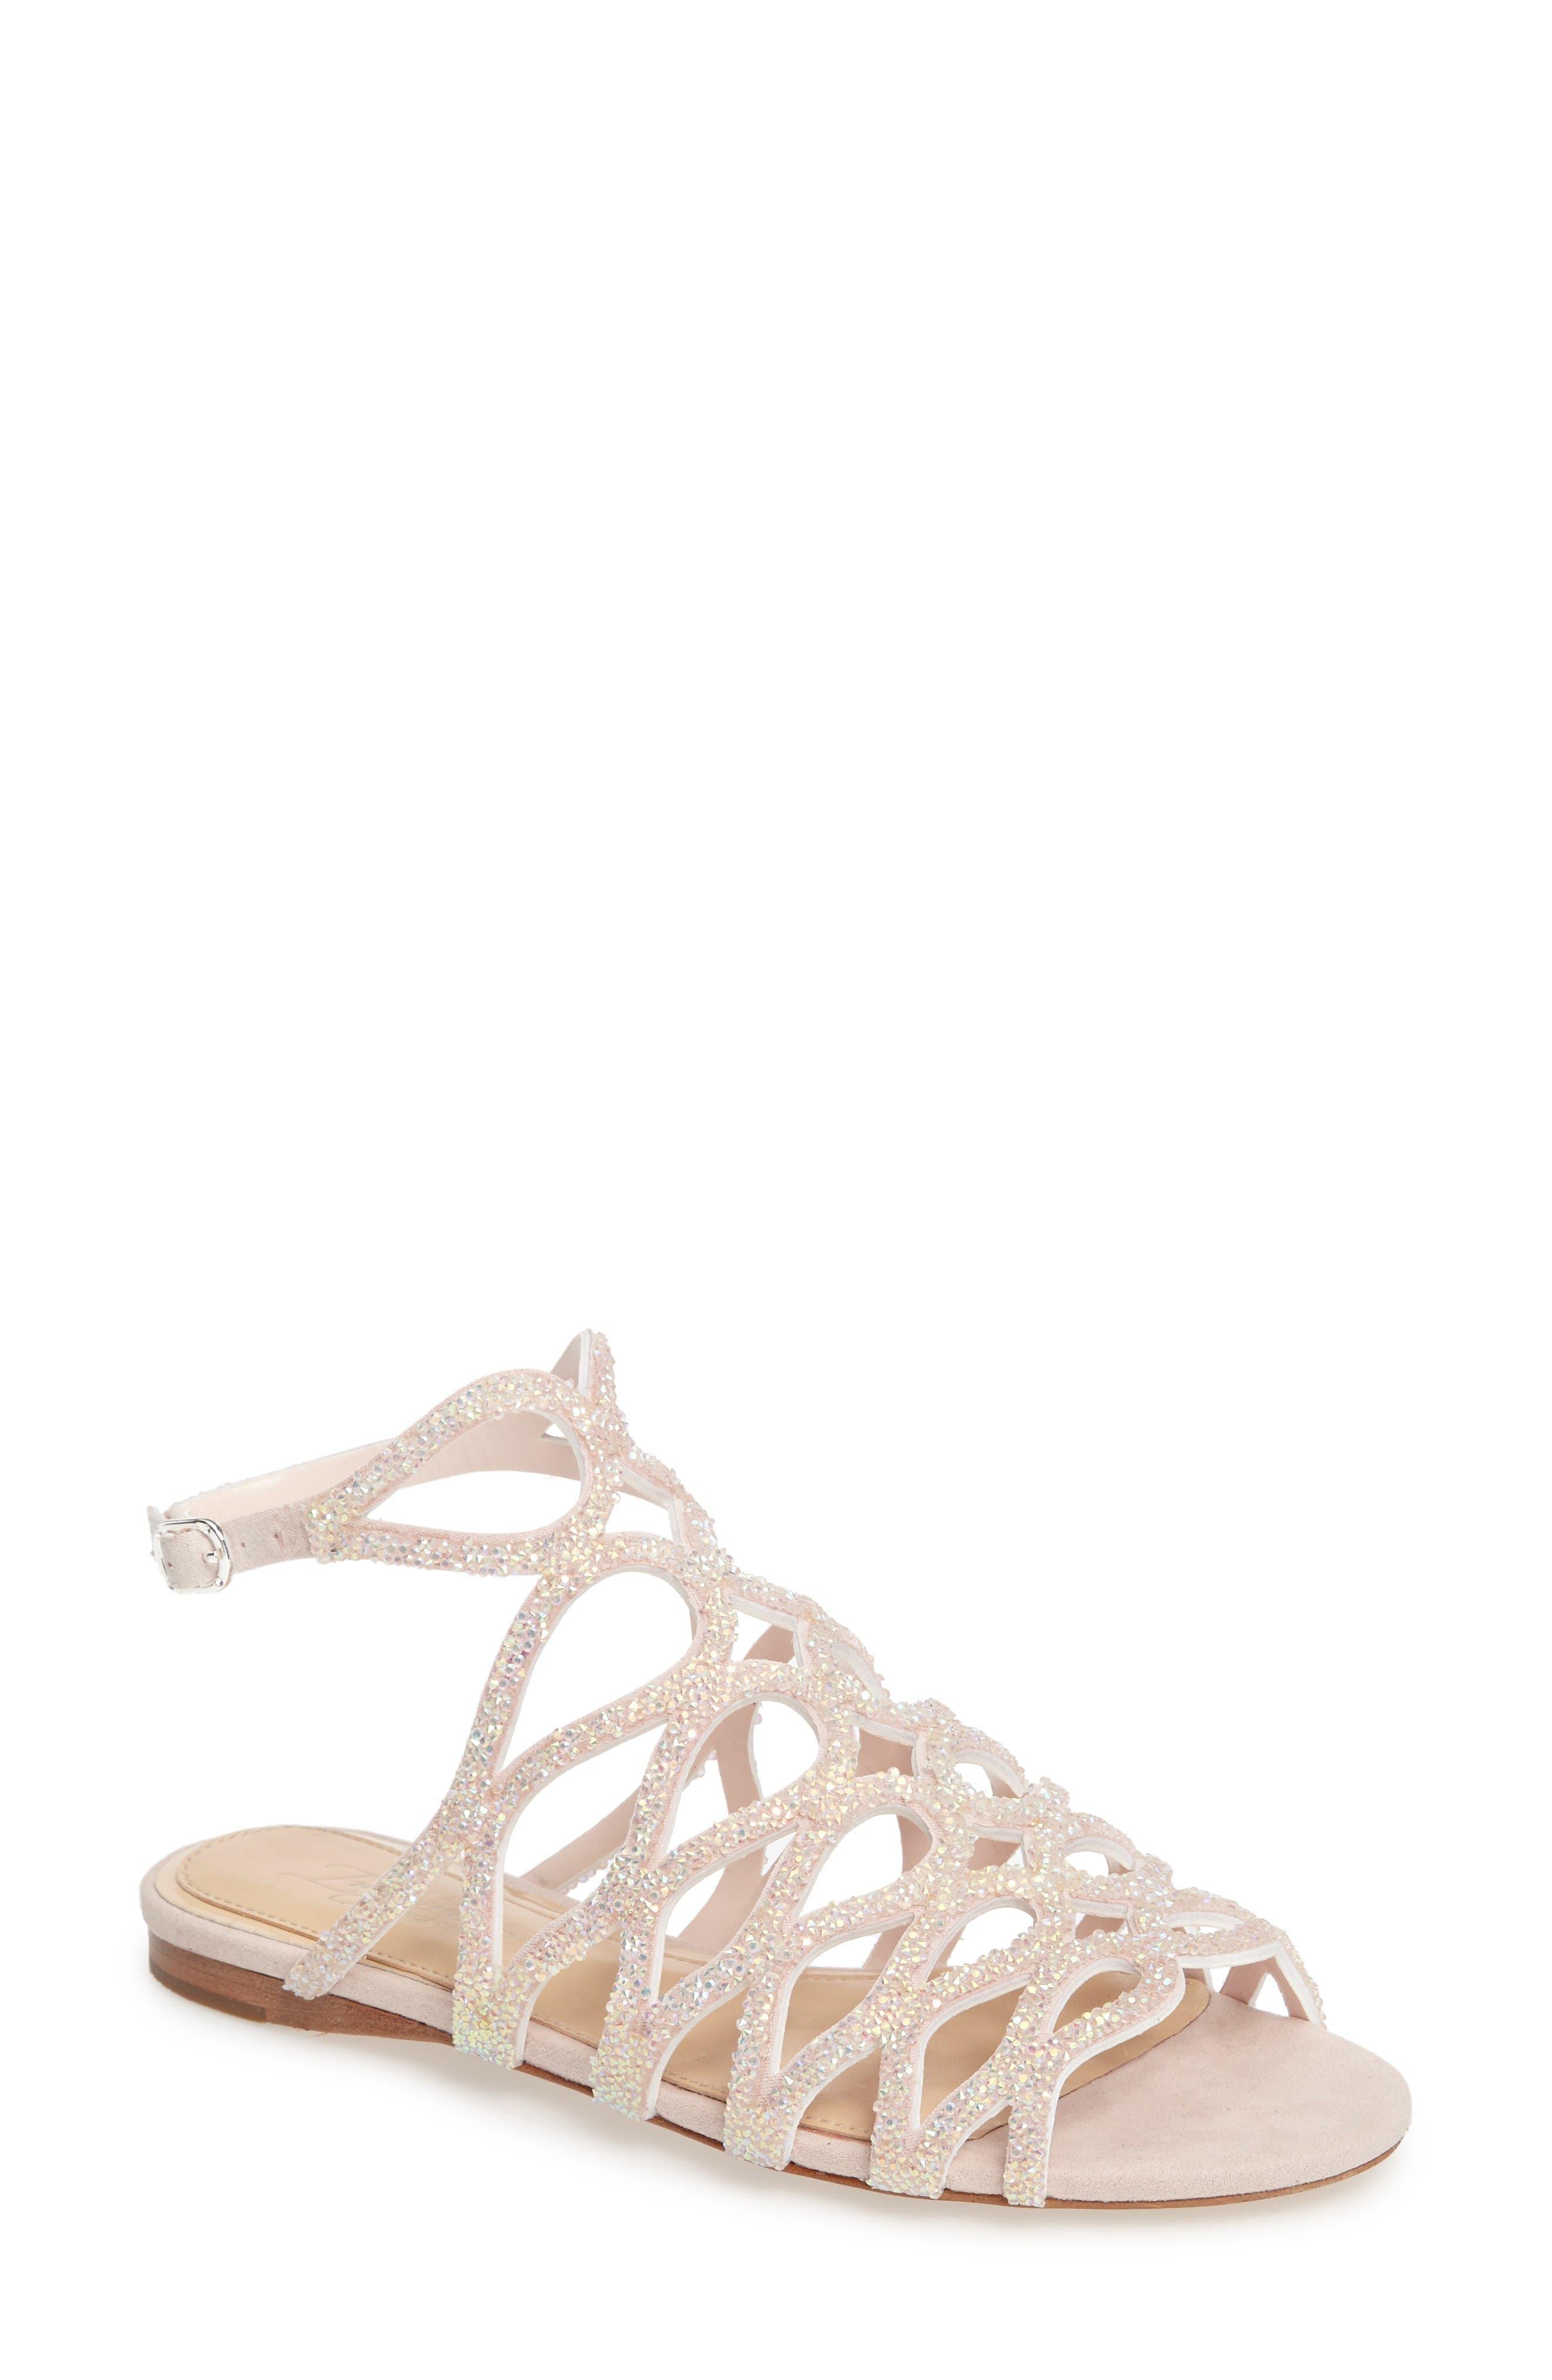 Ralee Glitter Sandal,                         Main,                         color, Iridescent Pink Satin